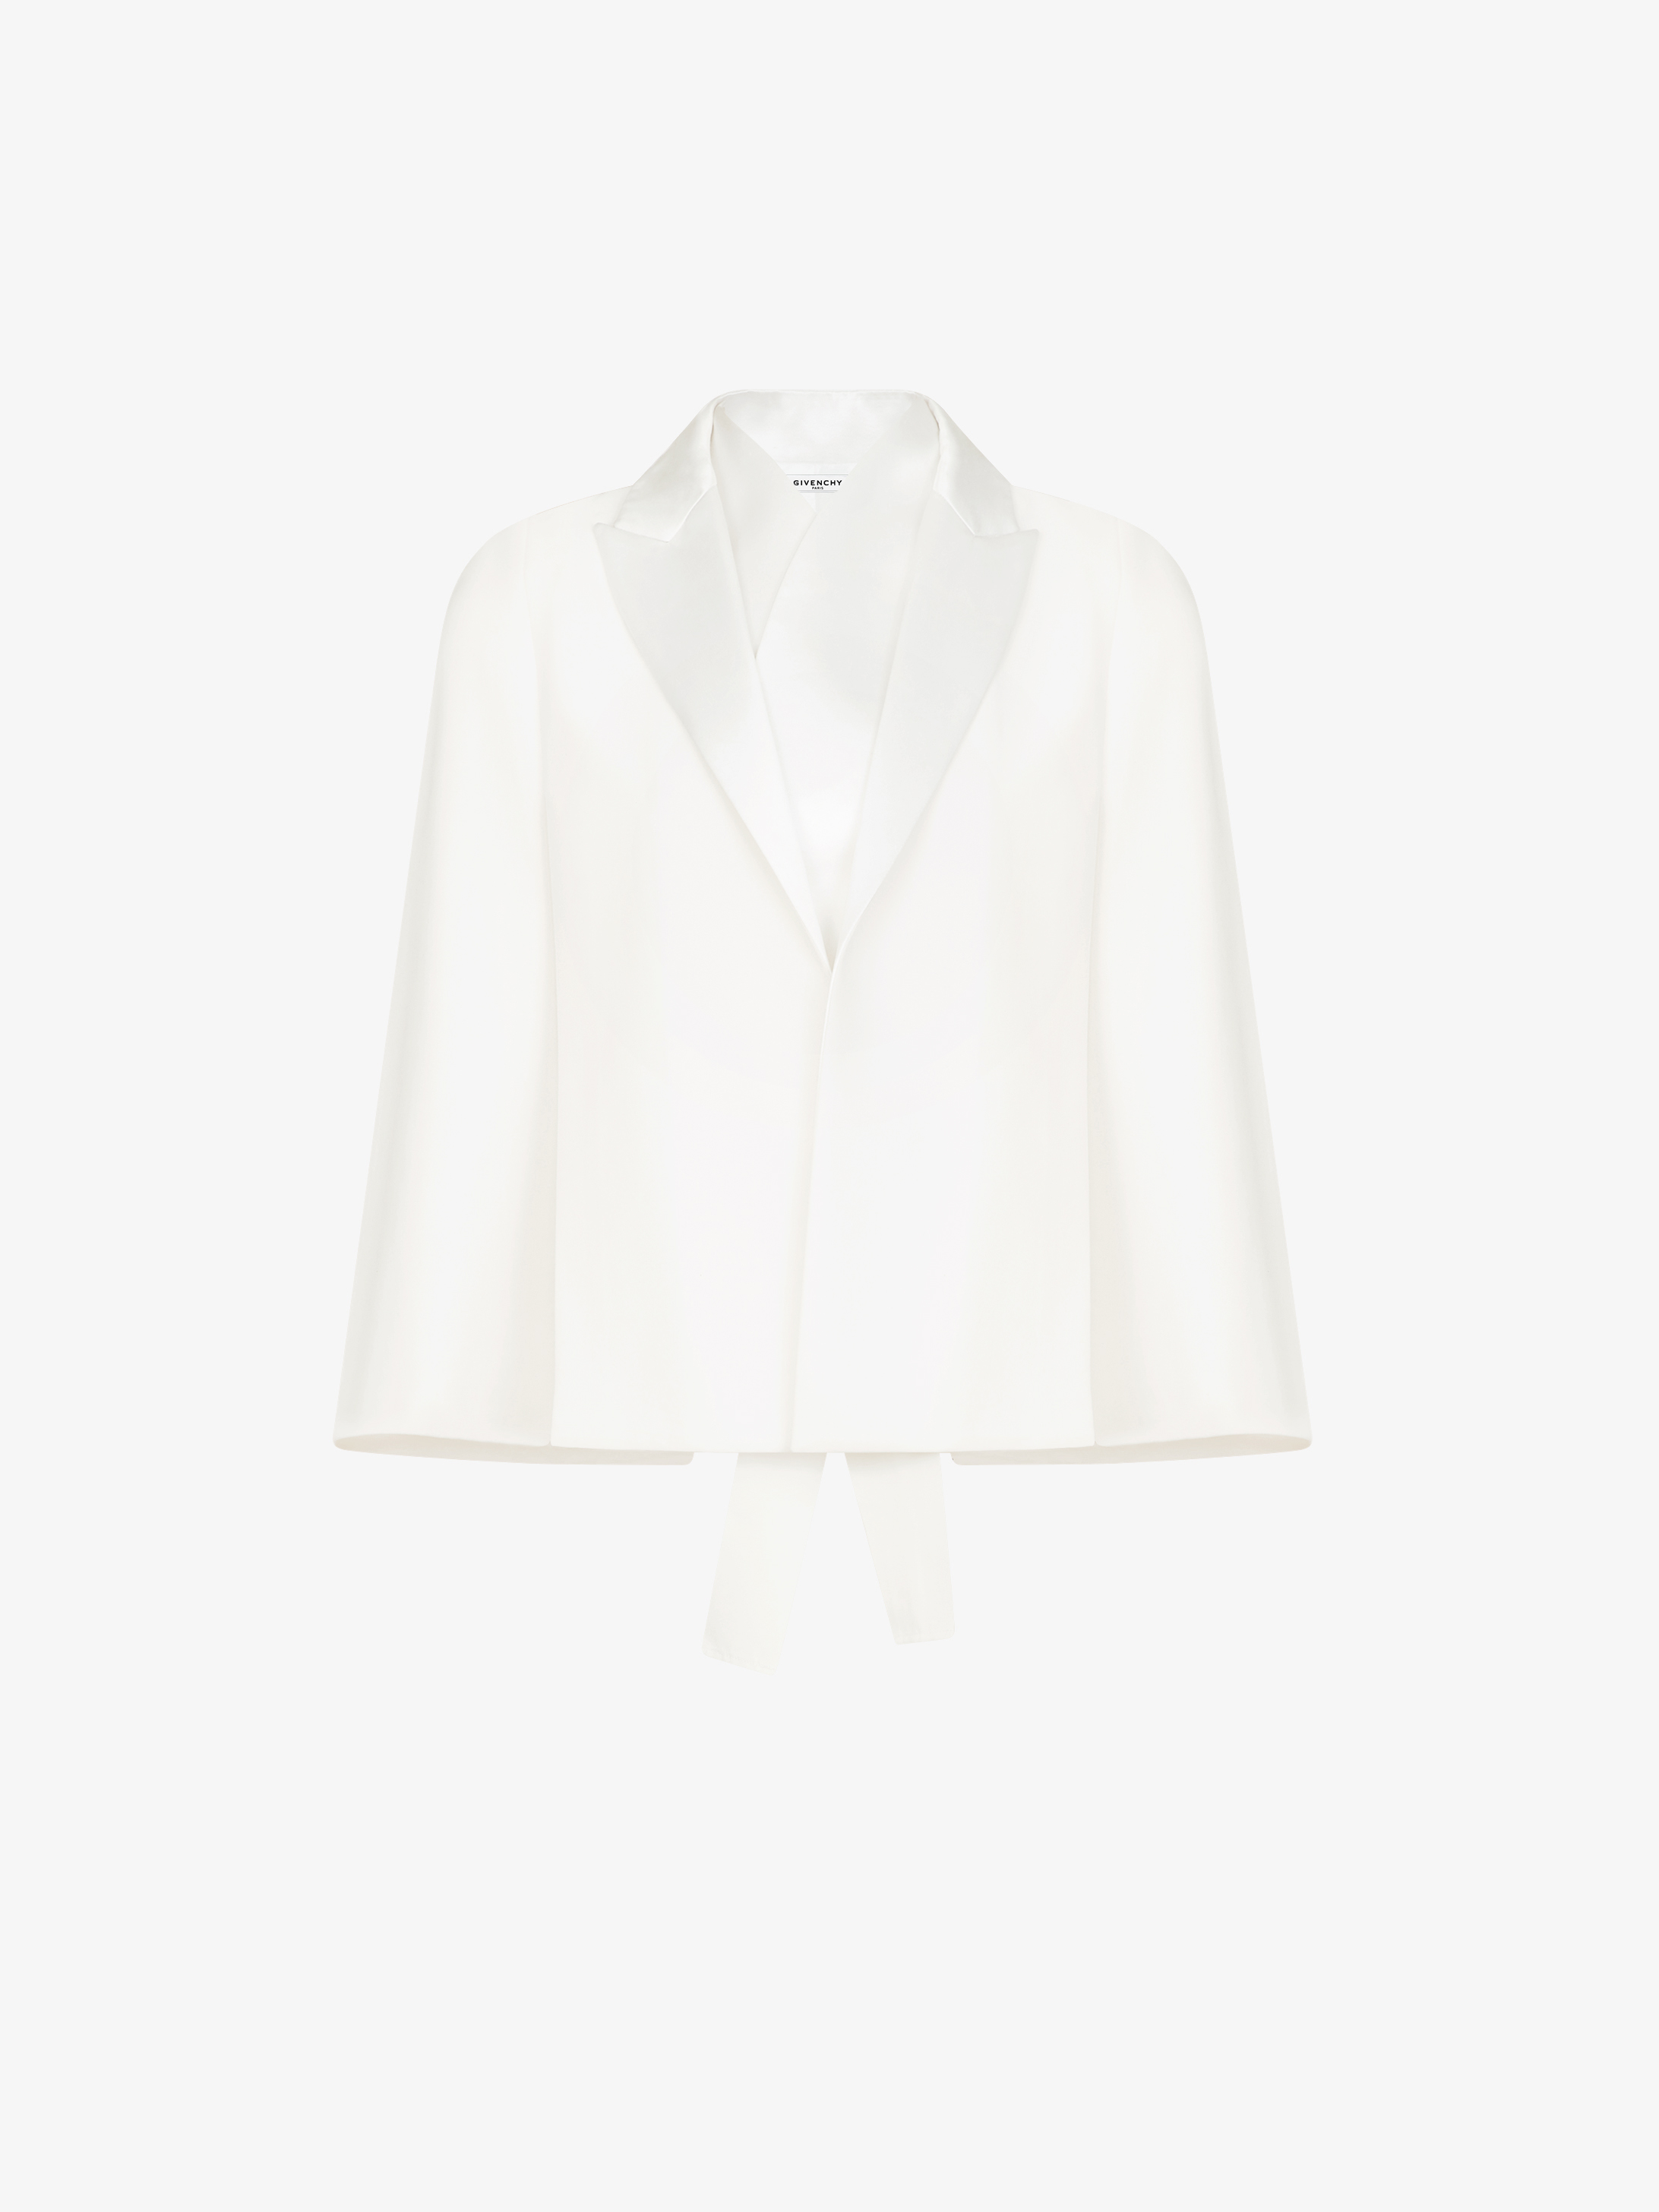 Cape-jacket in grain de poudre with tuxedo collar